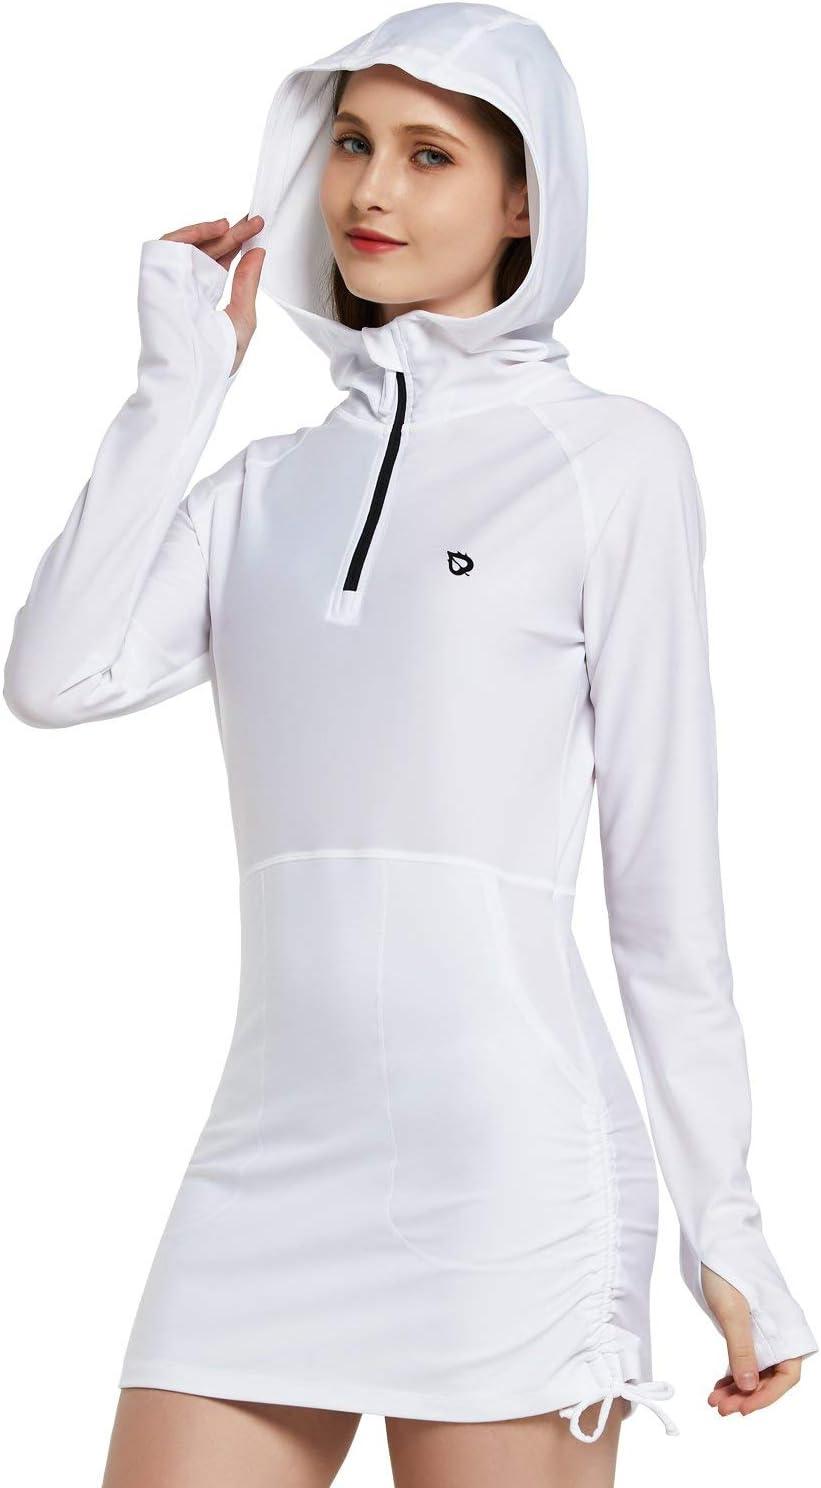 BALEAF Womens Long Sleeve Hooded Rash Guard Sun Protection Side Adjustable Swim Shirt Coverups UPF 50+